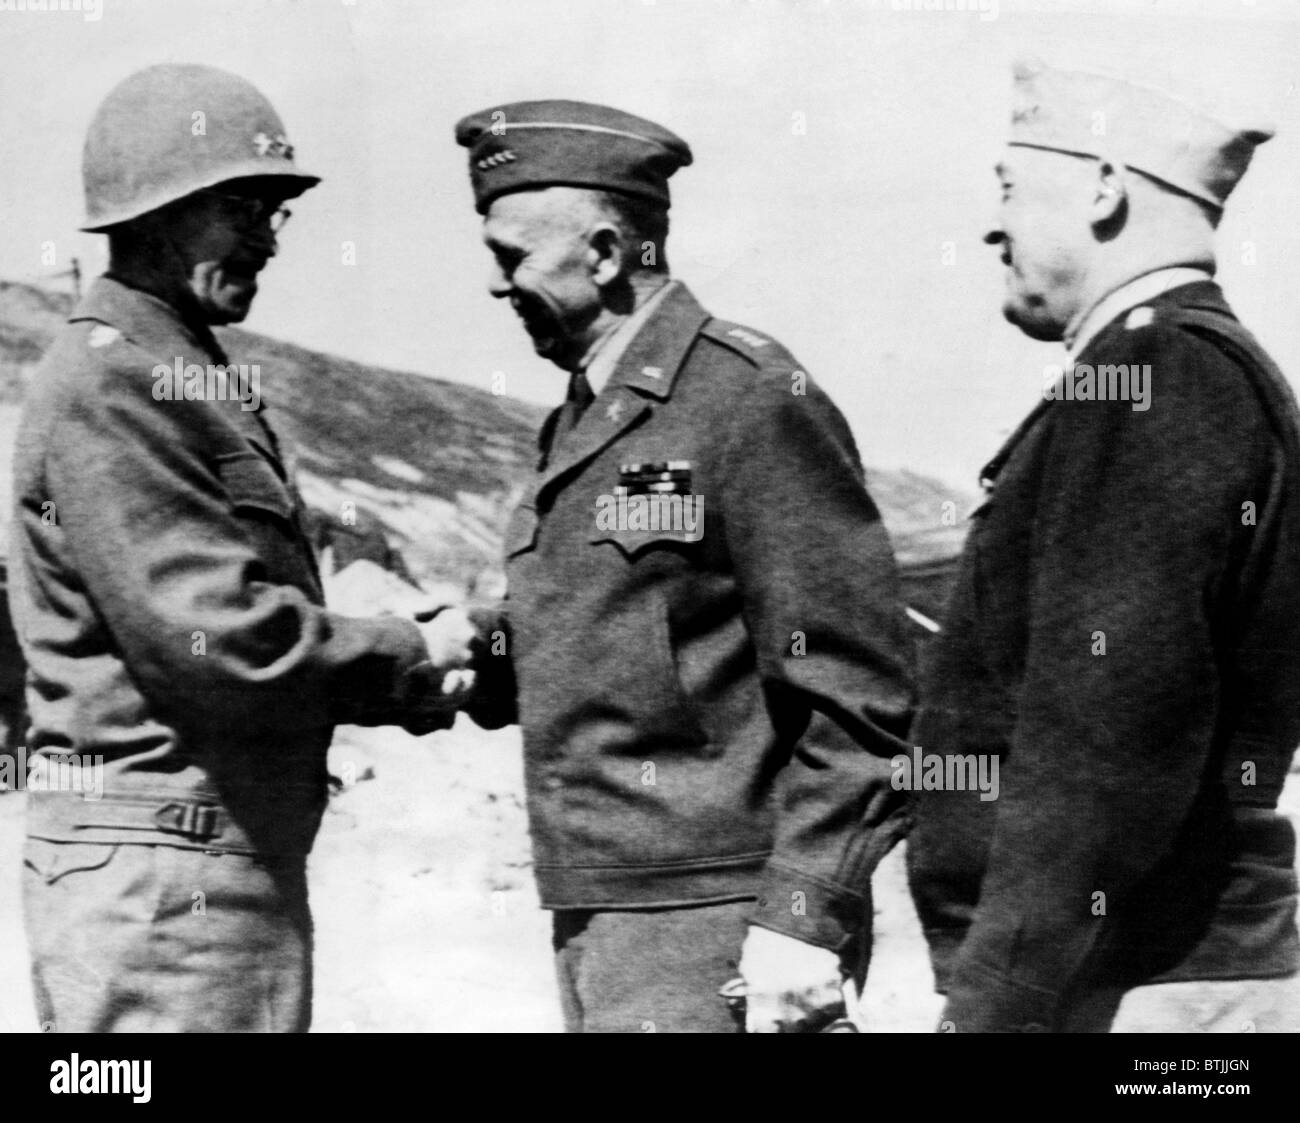 General george c marshall quotes - U S Army Field Commander General Omar Bradley General George C Marshall Air Force